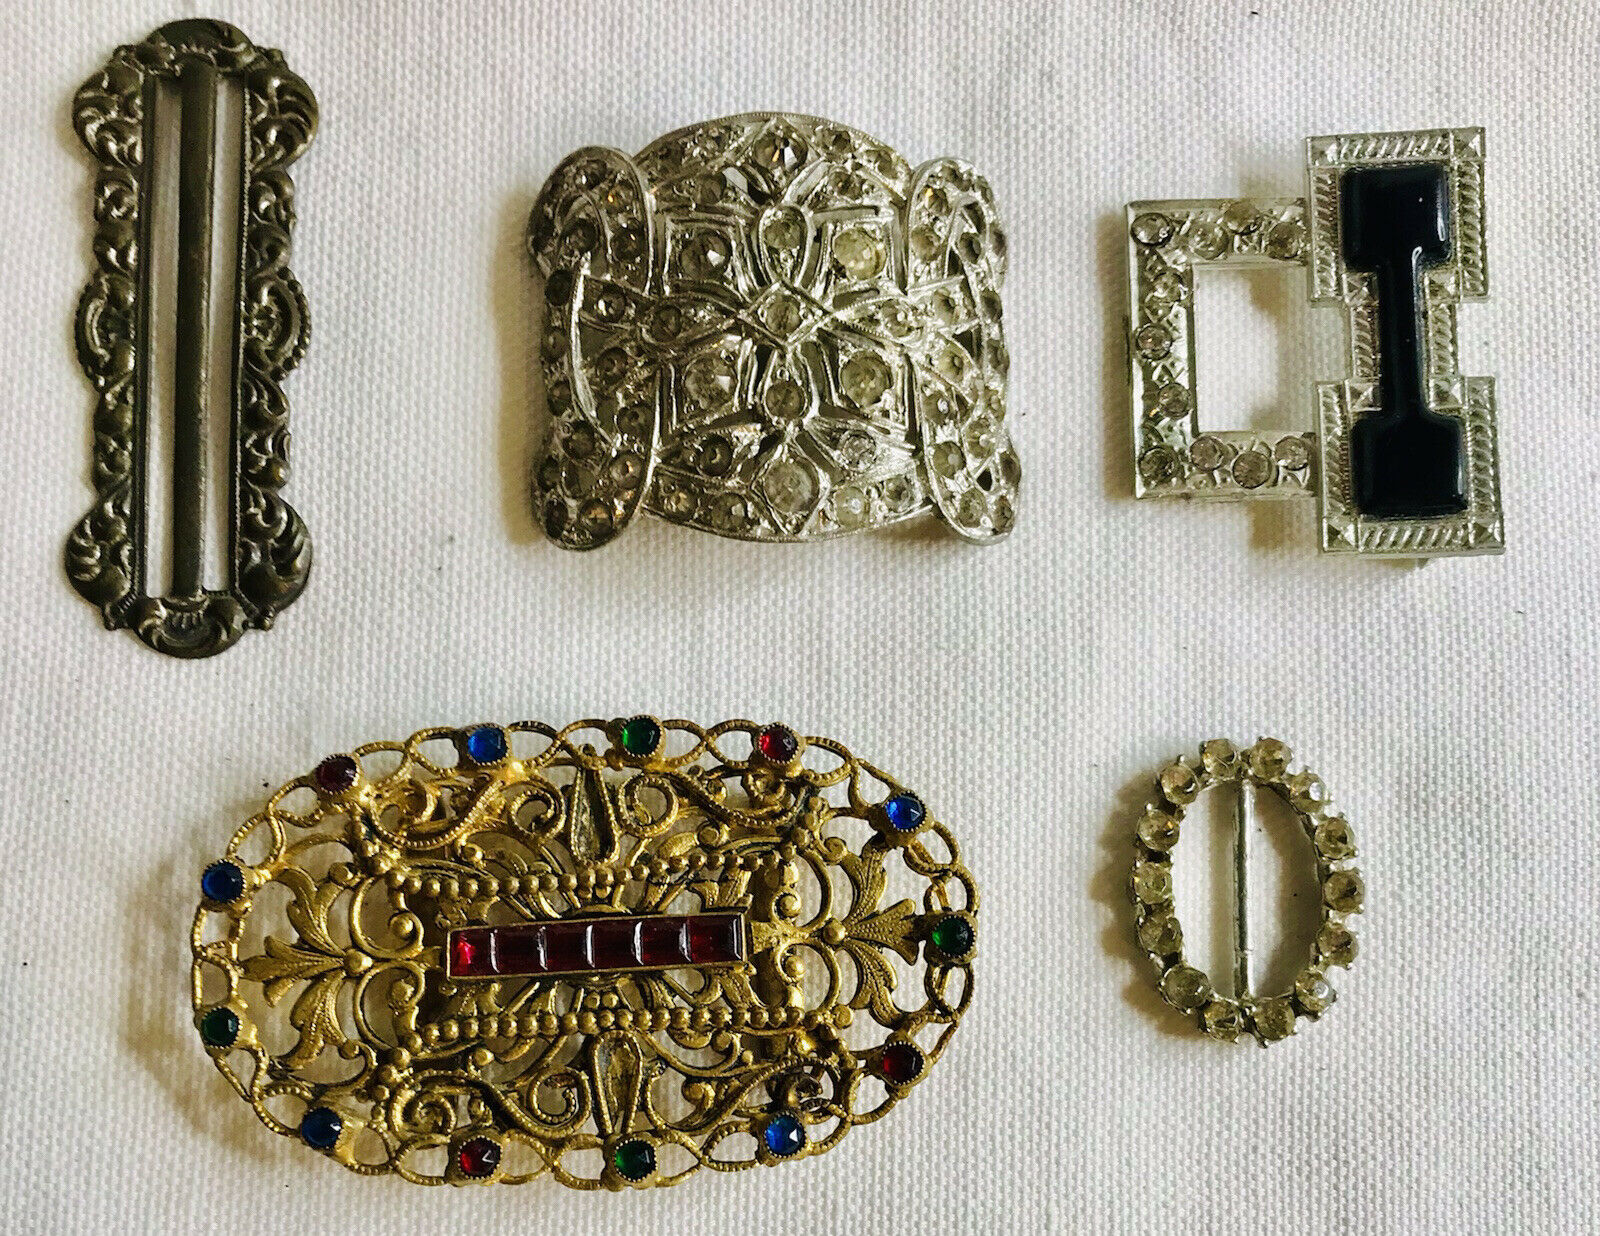 Lot of 5 Vintage Antique Late 1800s Forward Women's Belt Clips Stones Ornate